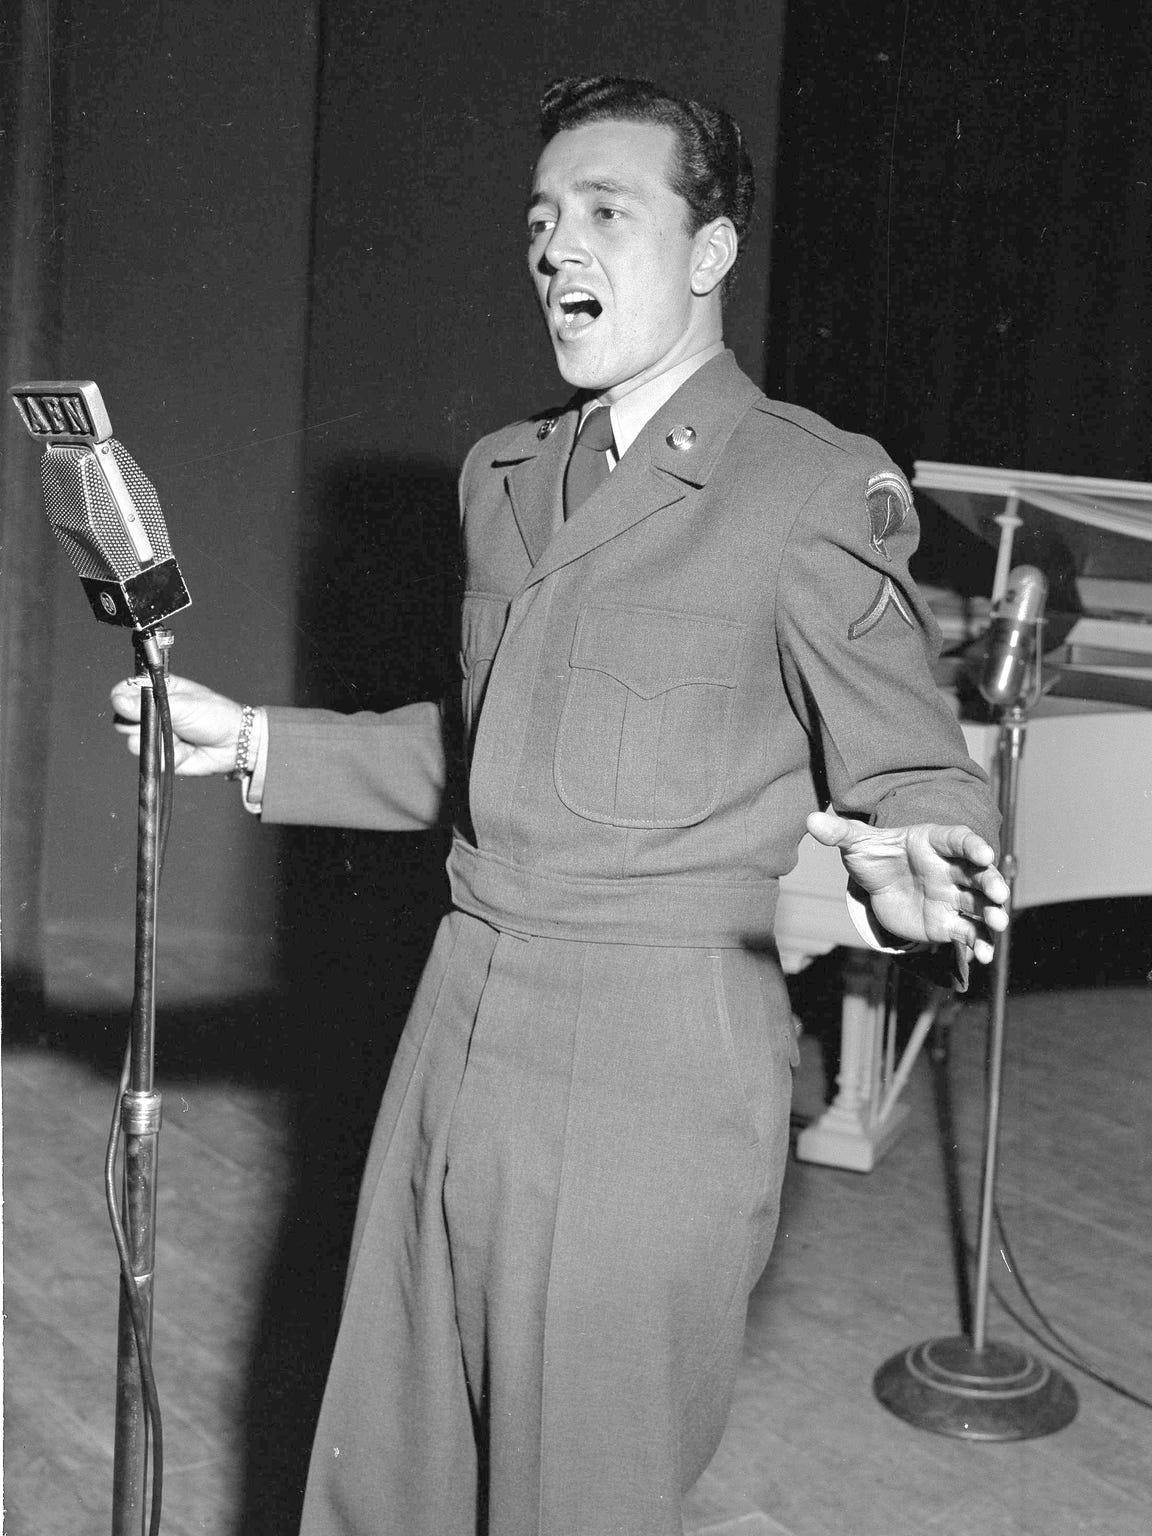 Pfc. Vic Damone, former radio, TV and stage singer,